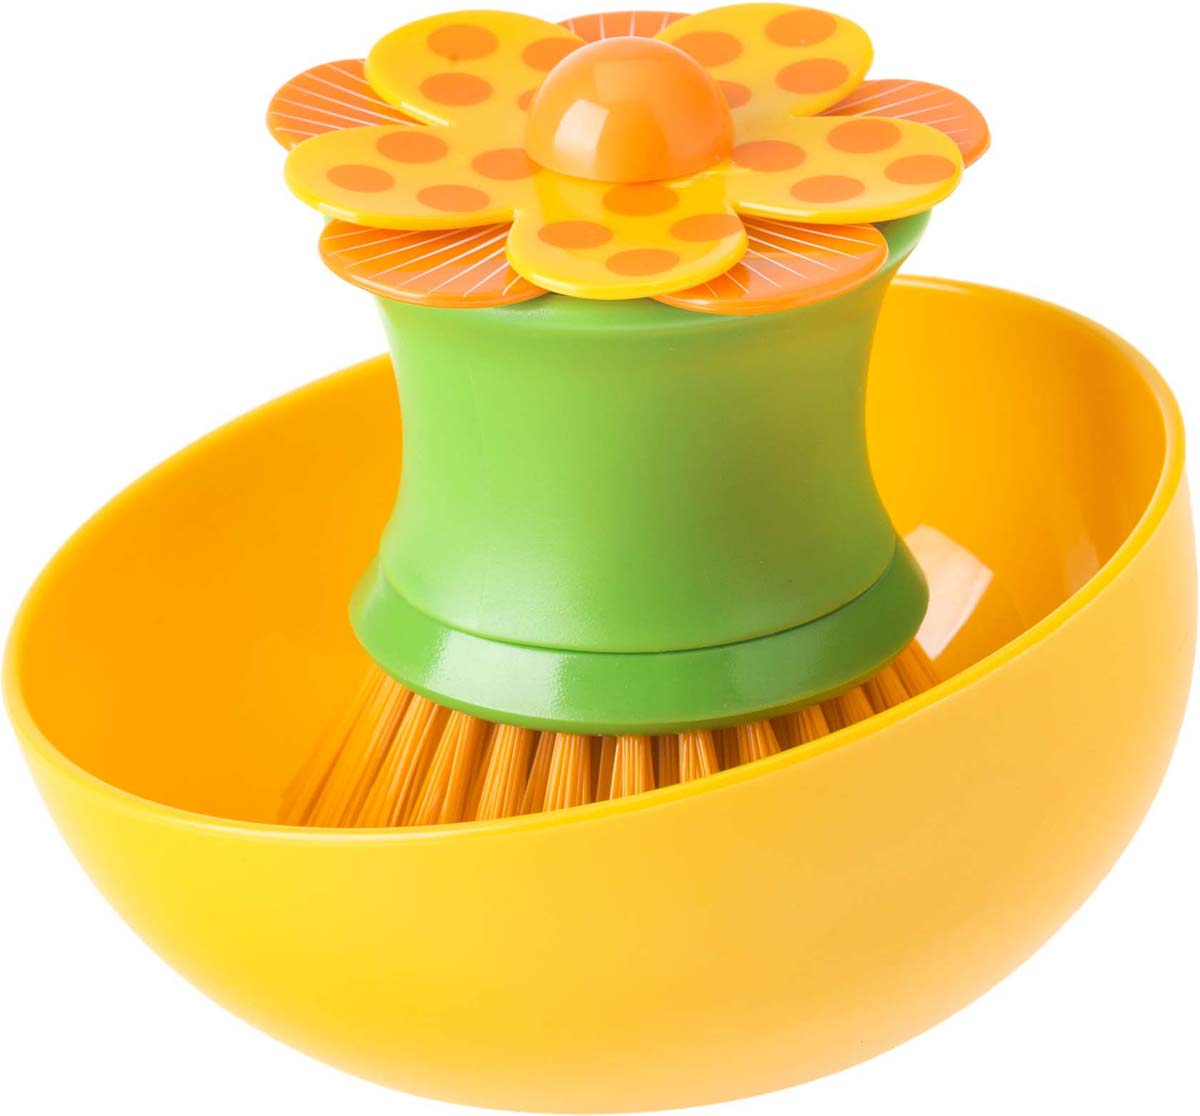 Щетка для посуды Vigar Lolaflor, цвет: желтый